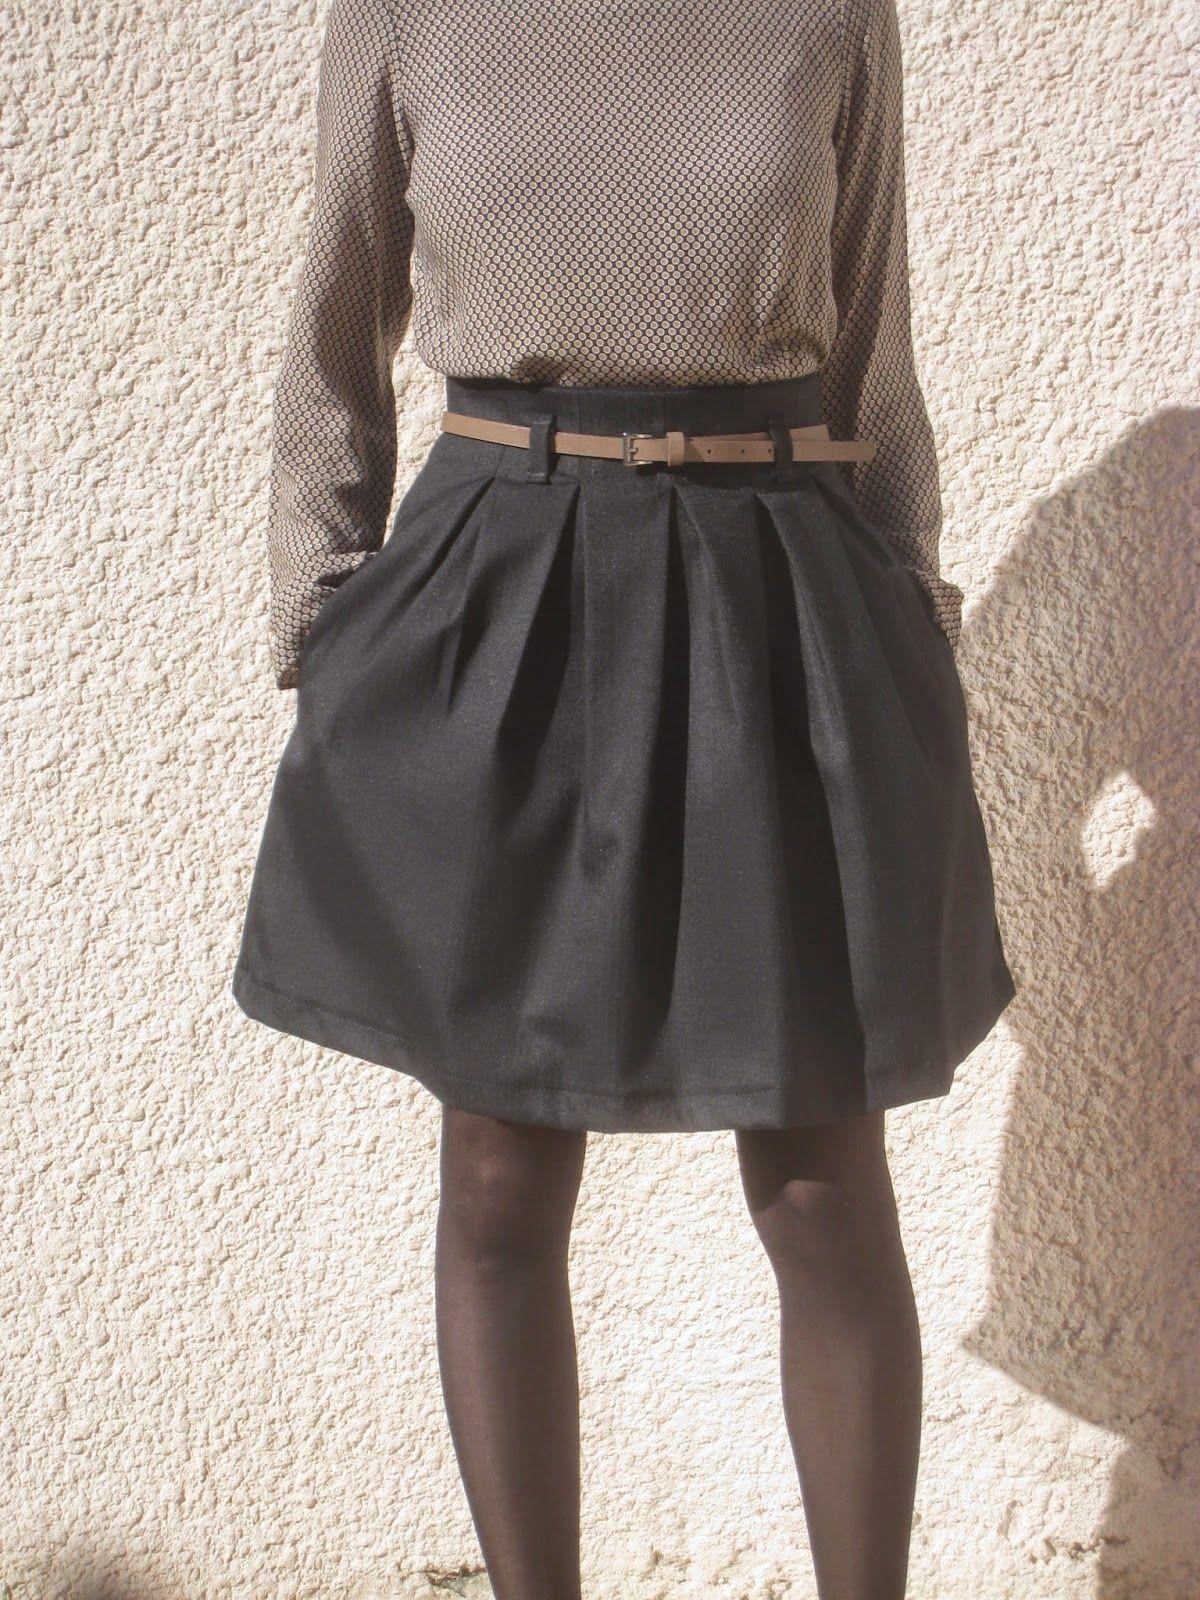 Blog de couture